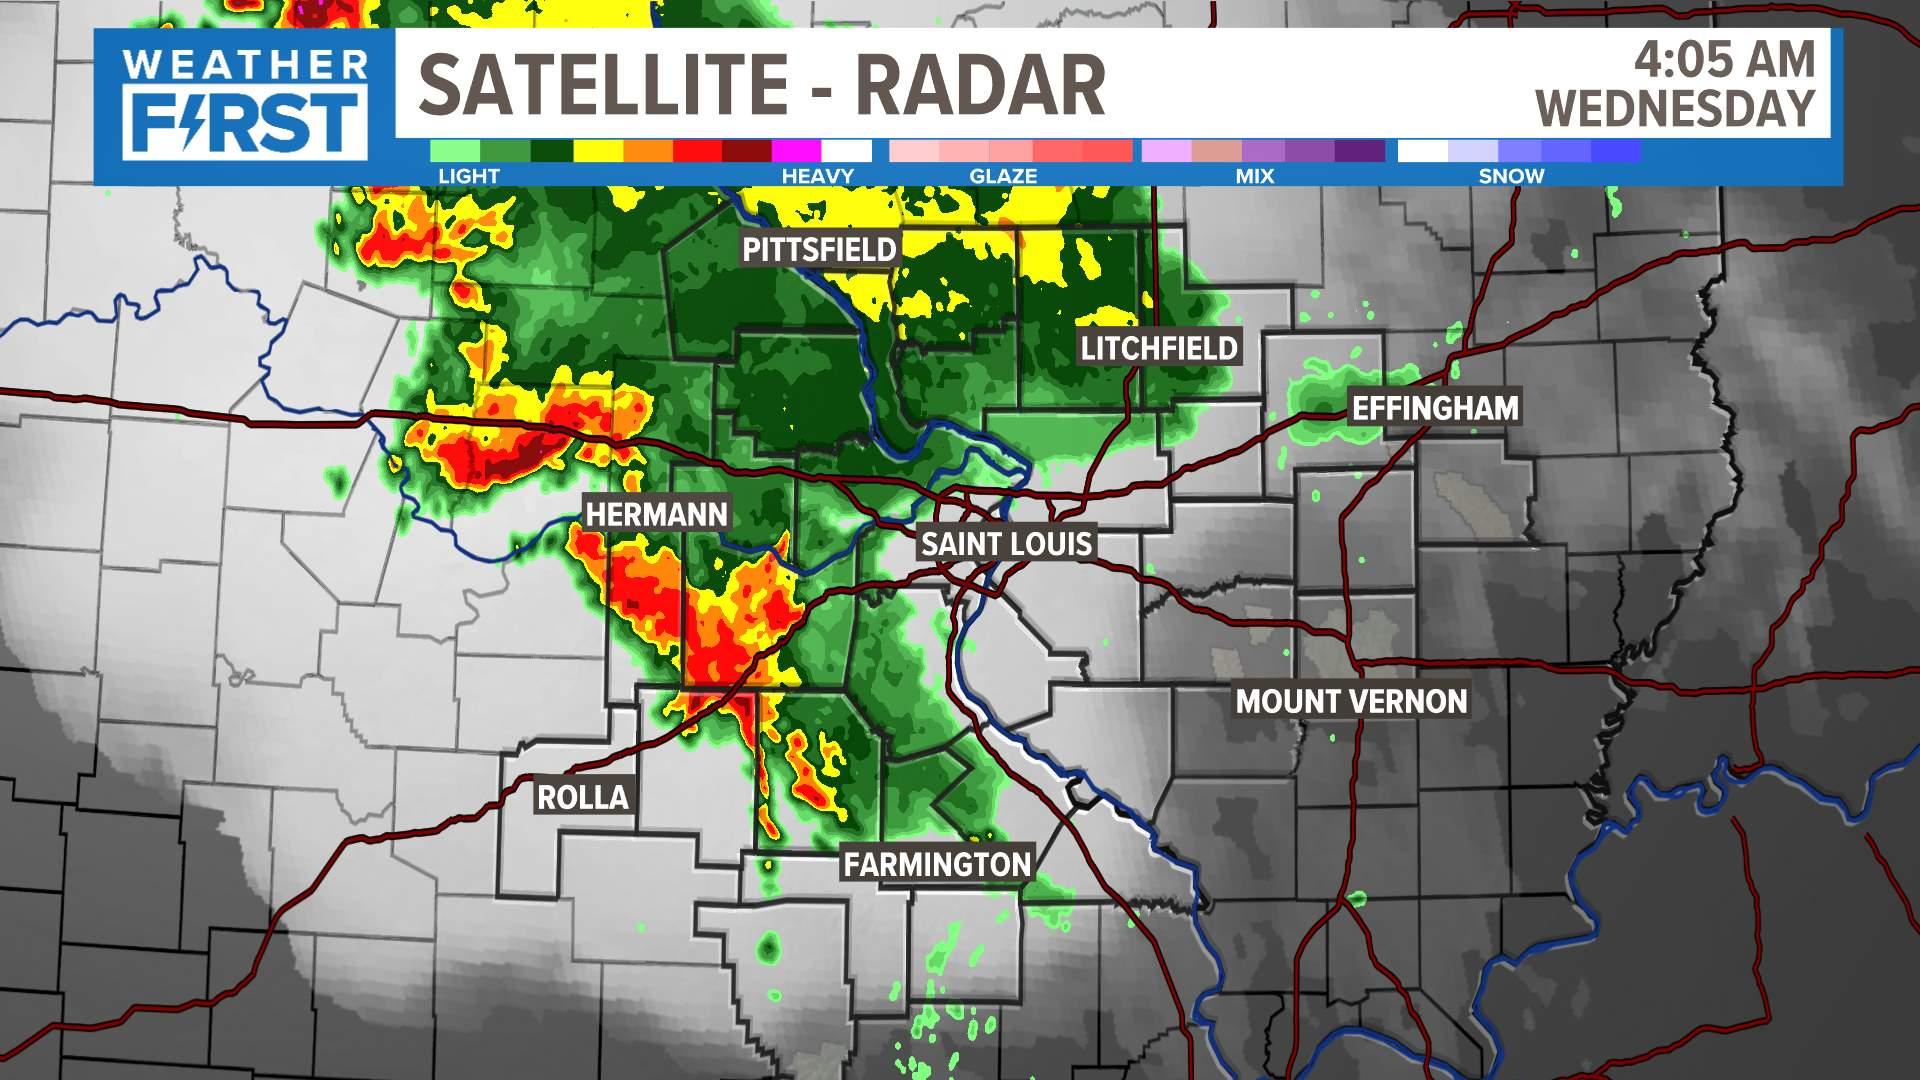 Local Satellite and Radar